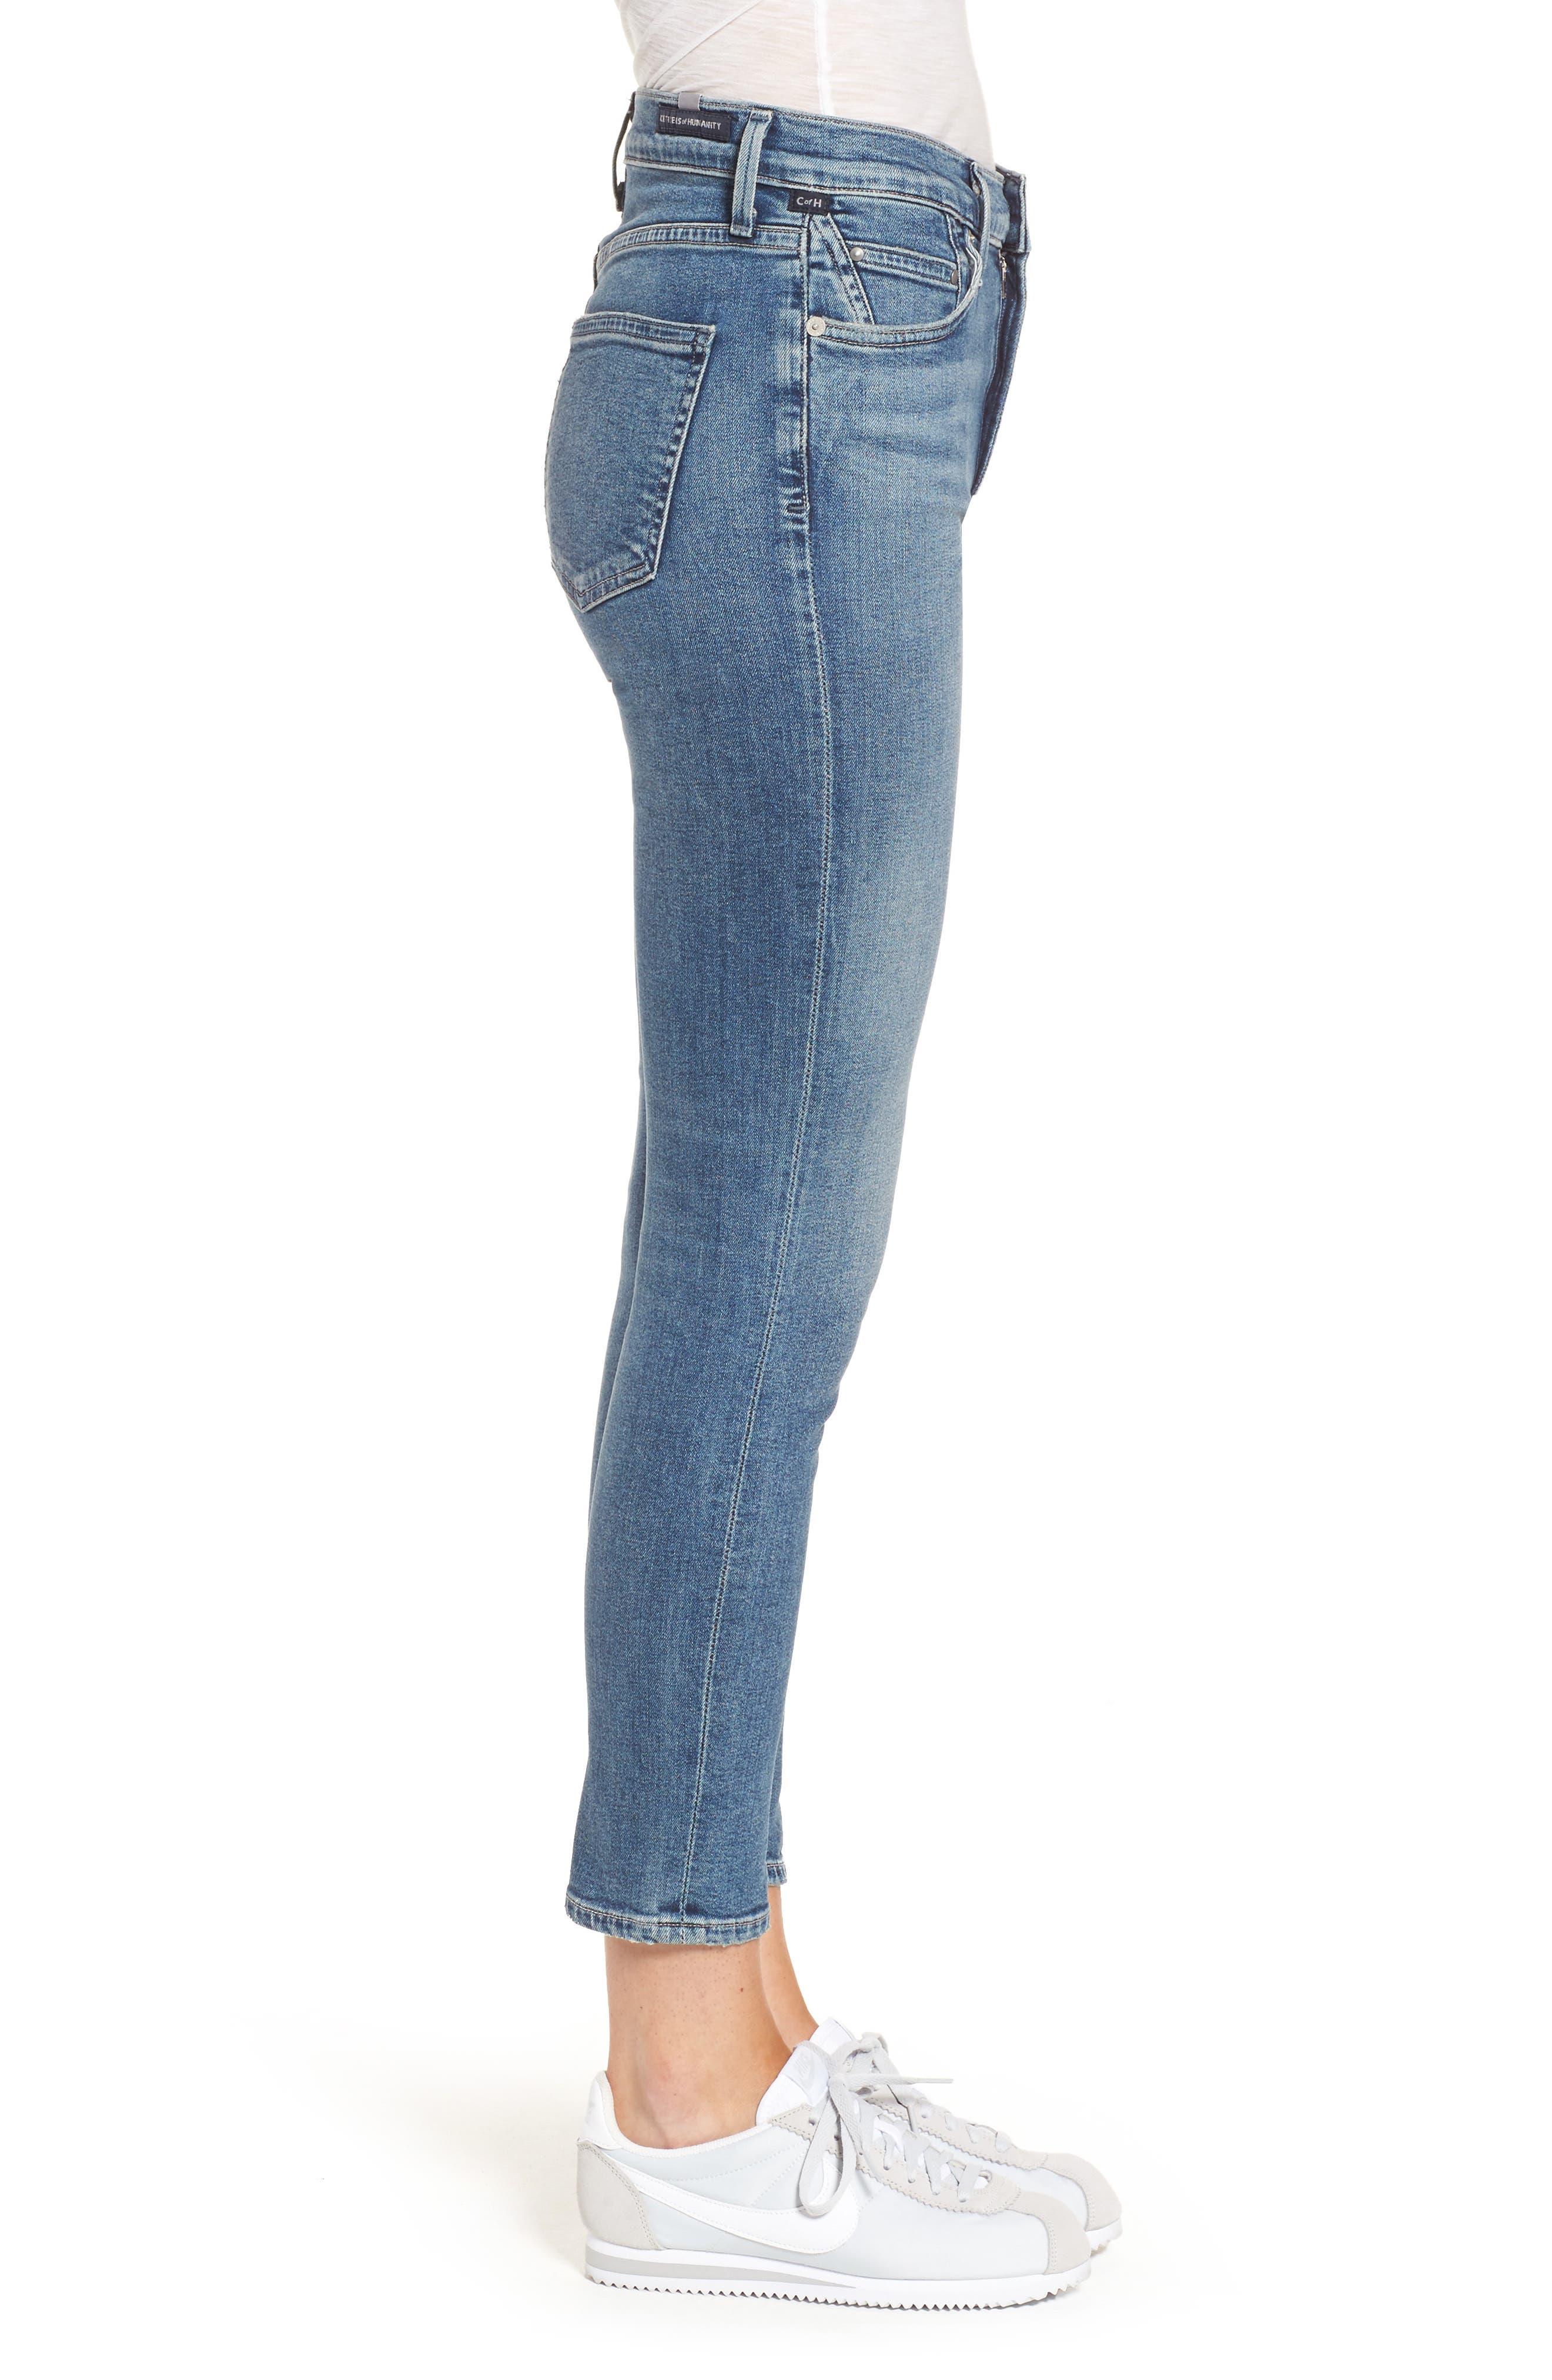 Alternate Image 3  - Citizens of Humanity Rocket Crop Skinny Jeans (Orbit)